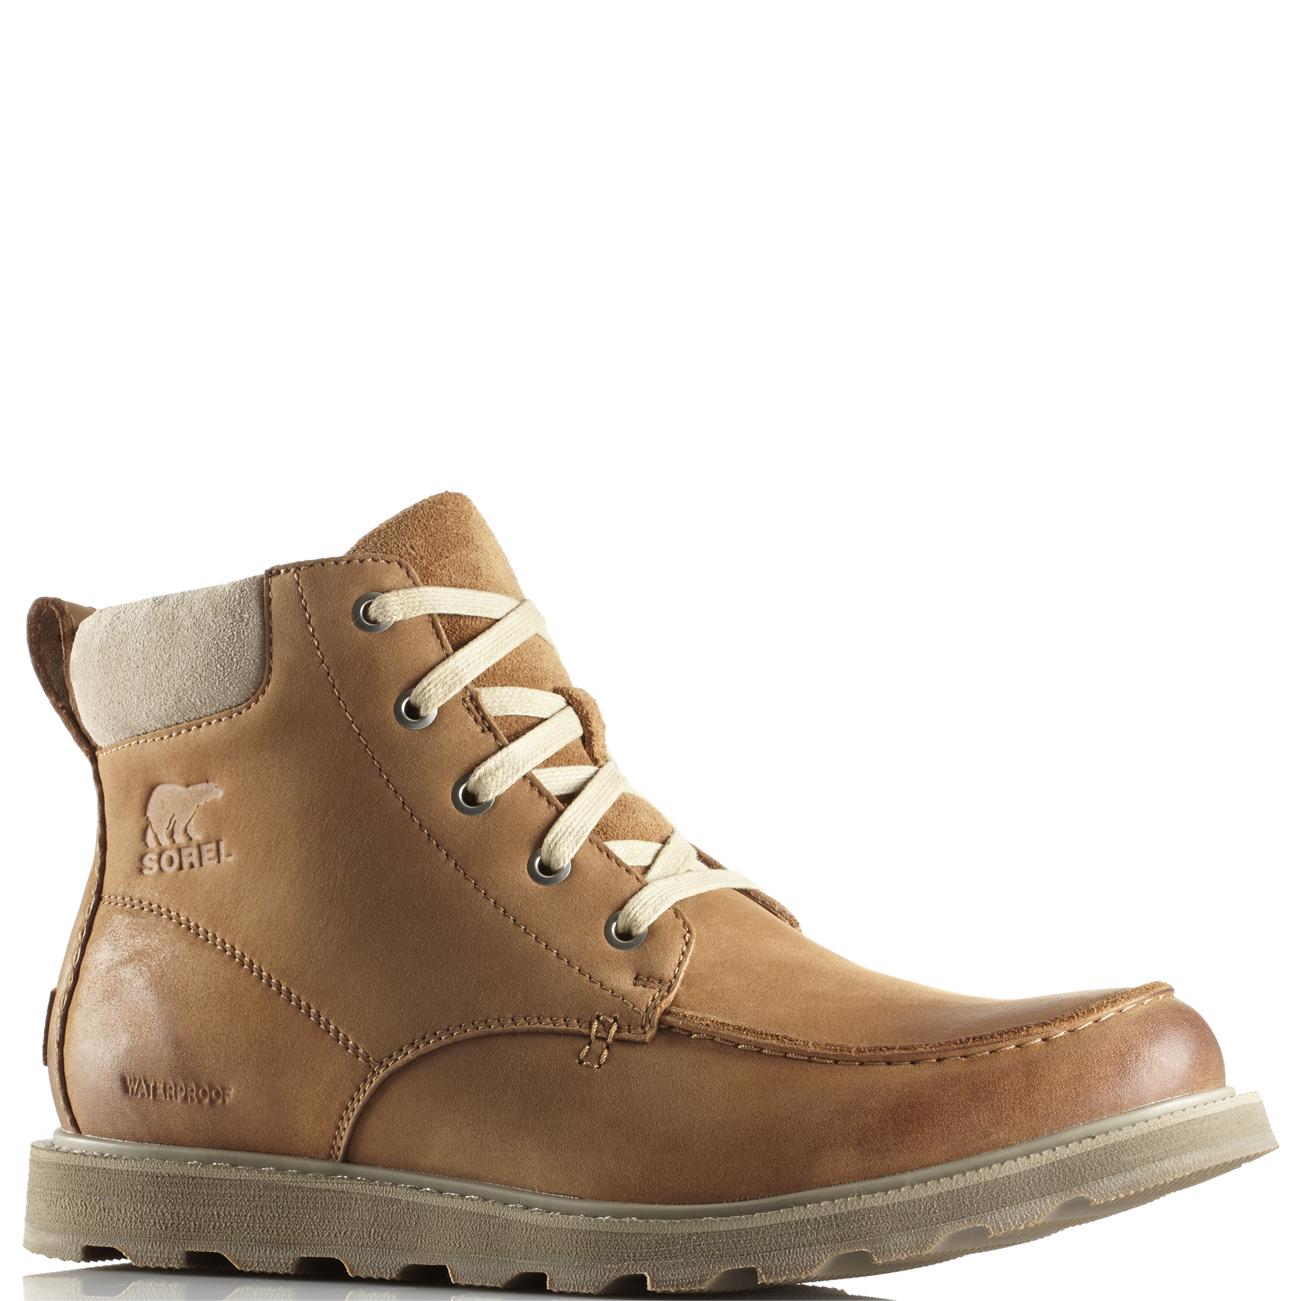 92c77508 Mens Sorel Madson Moc Toe Waterproof Nubuck Snow Winter Hiker Ankle Boot UK  7-13